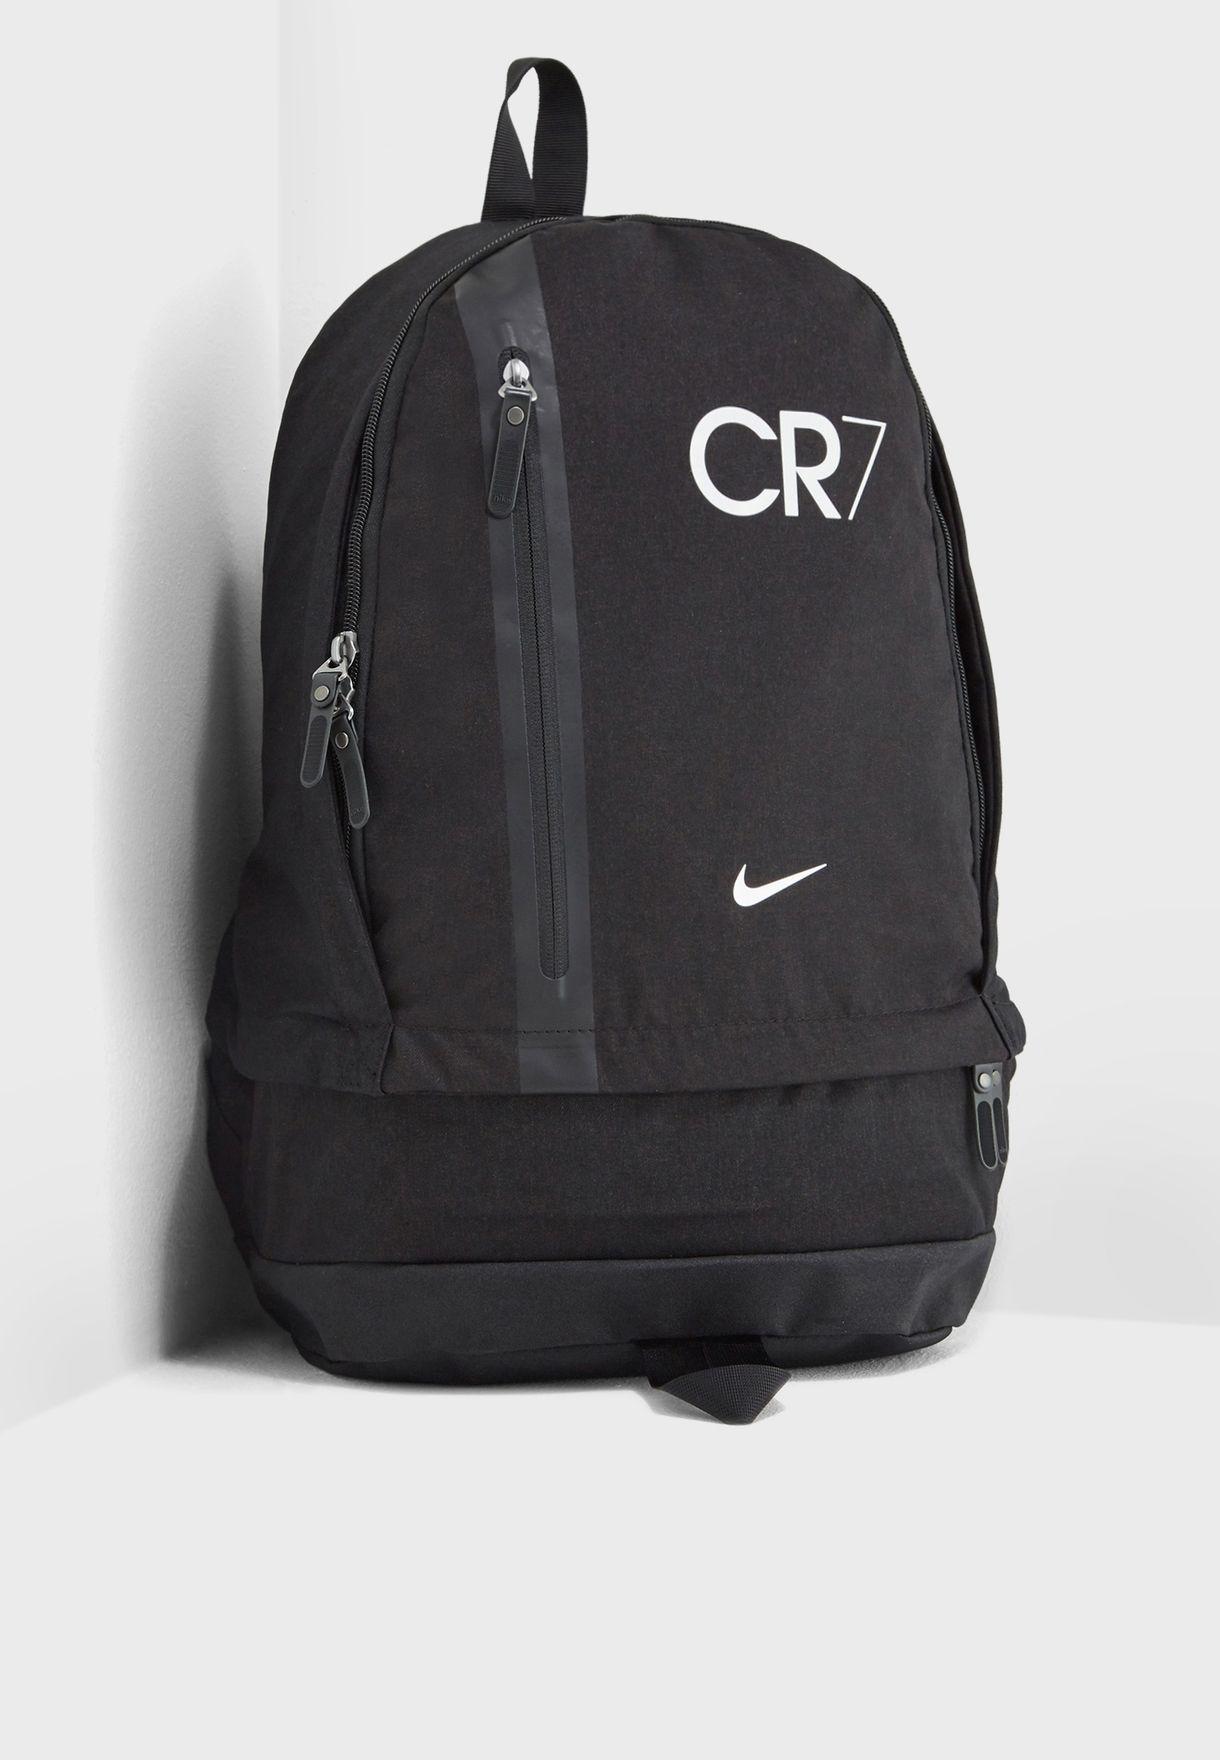 72b61755ffe8c Shop Nike black CR7 Cheyenne Backpack BA5562-010 for Men in UAE ...